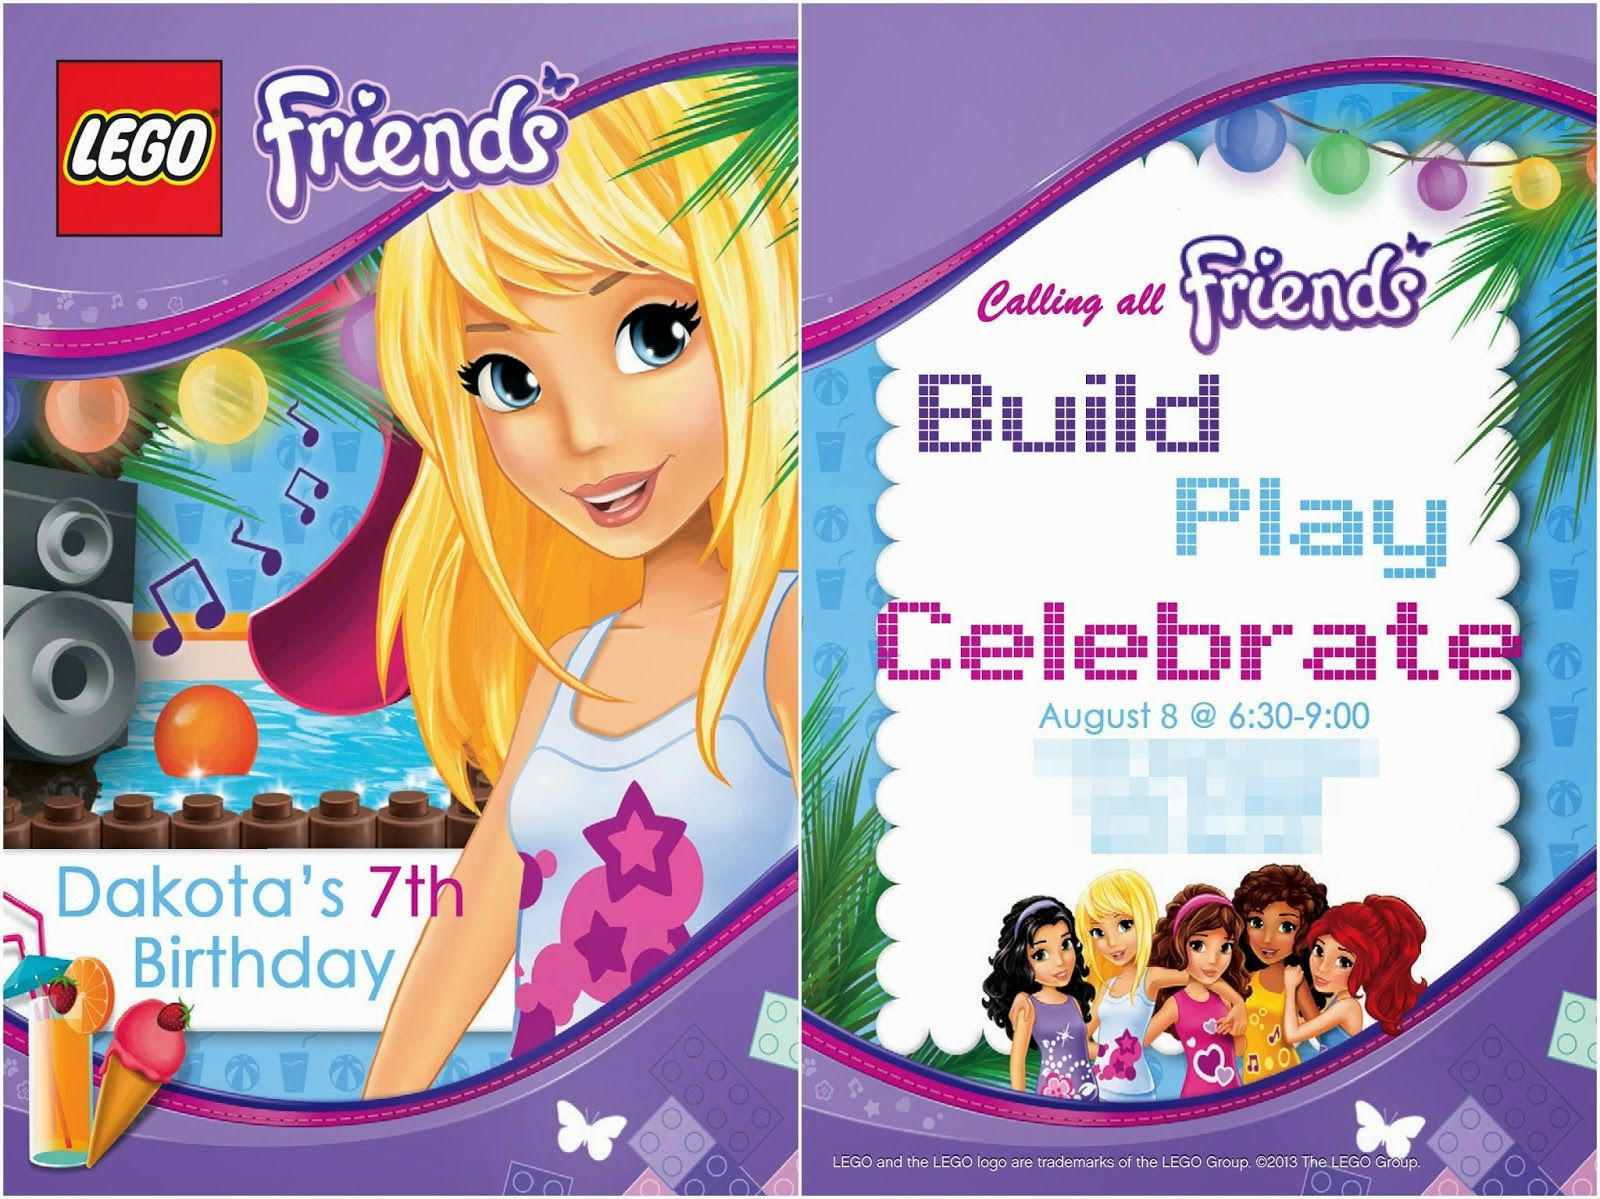 free lego friends birthday invite add